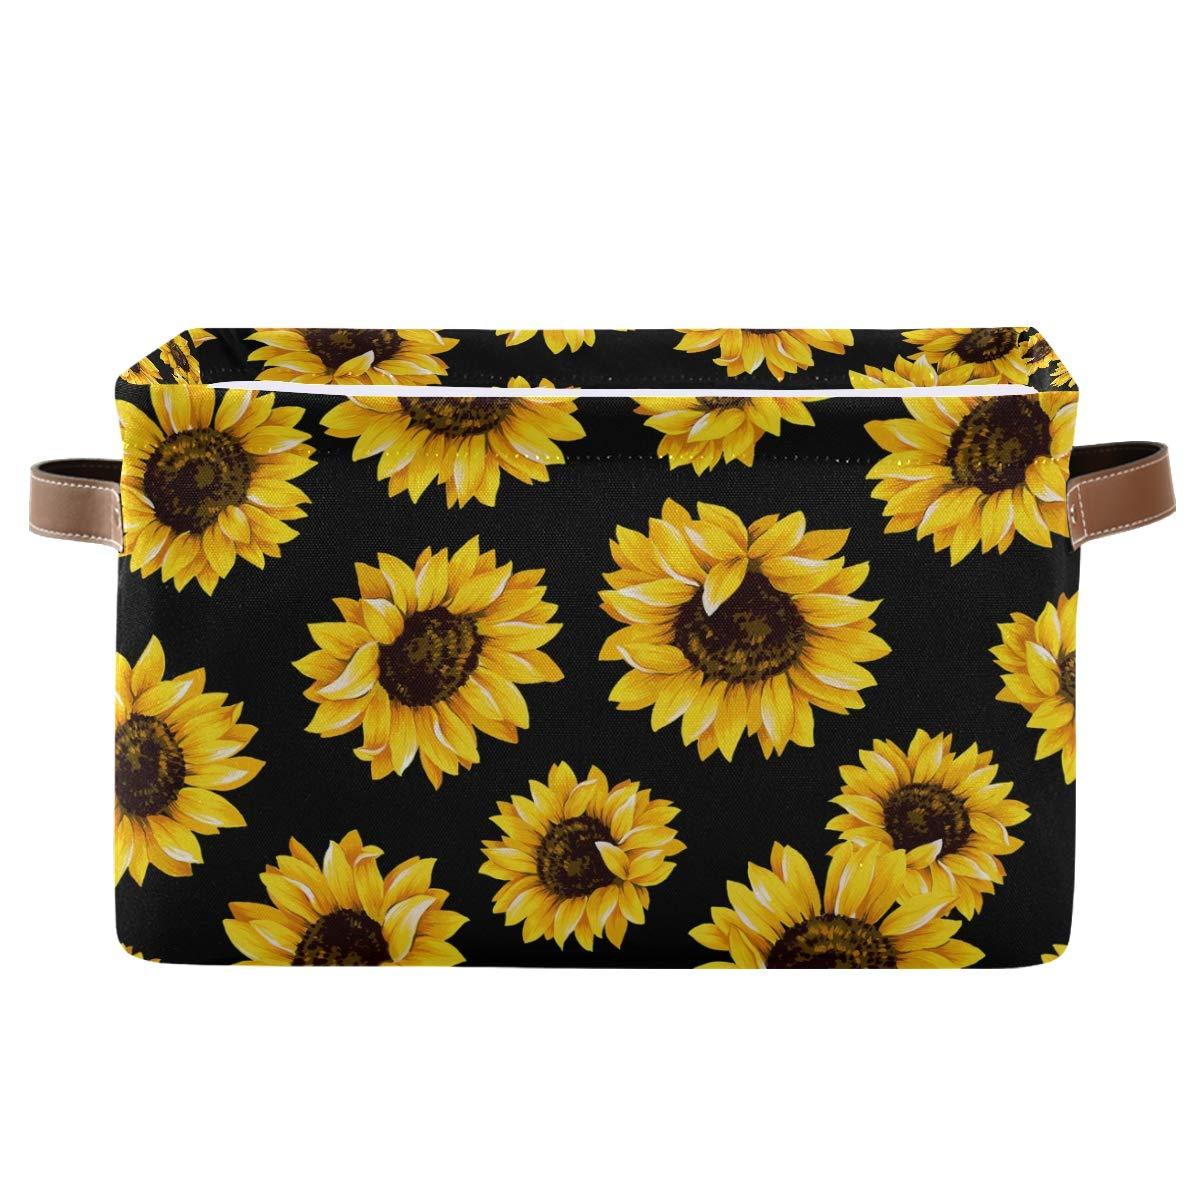 Rectangular Storage Bin Outstanding Beautiful with Sunflowers Handles Basket wholesale